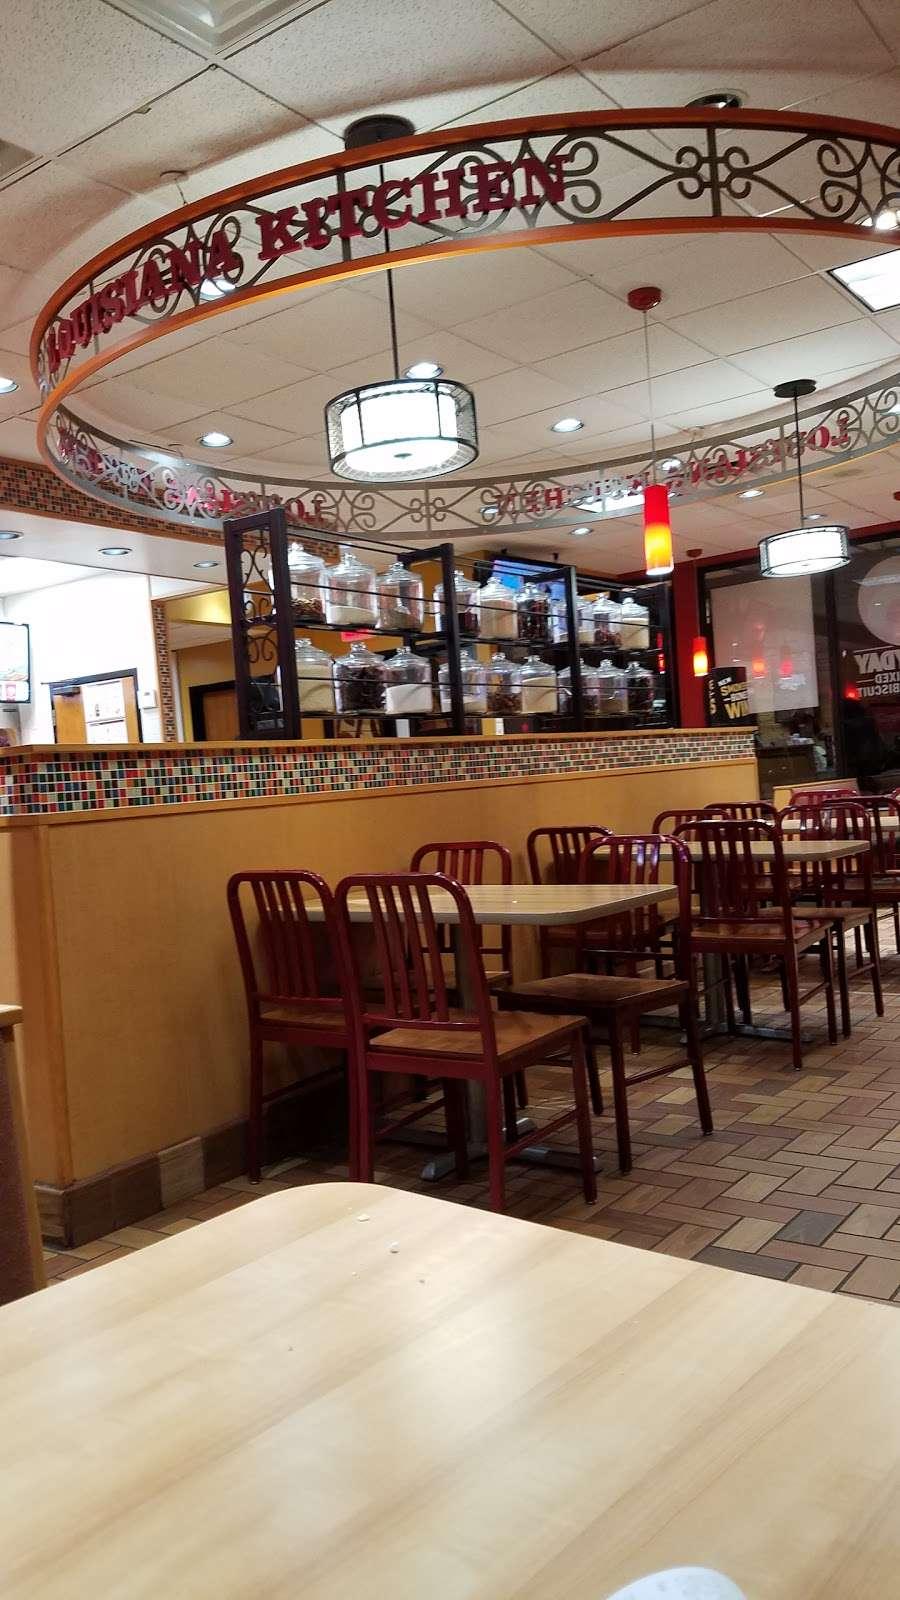 Popeyes Louisiana Kitchen 5353 N Harlem Ave Chicago Il 60656 Usa